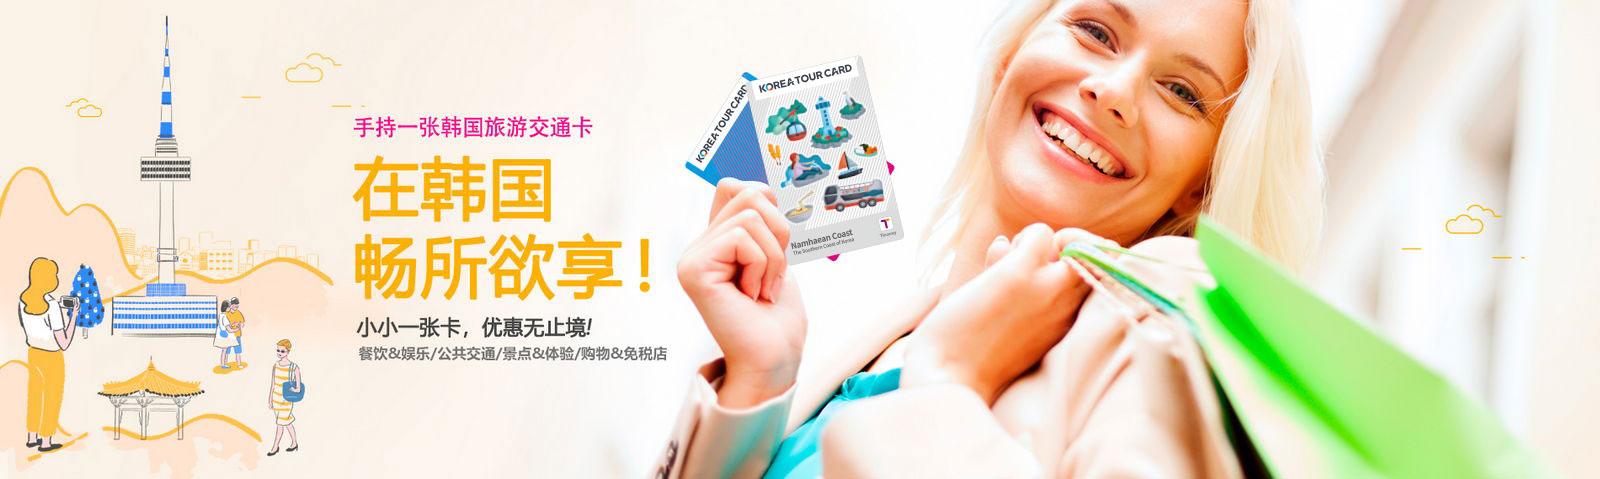 04-ktc_slide_banner_cn